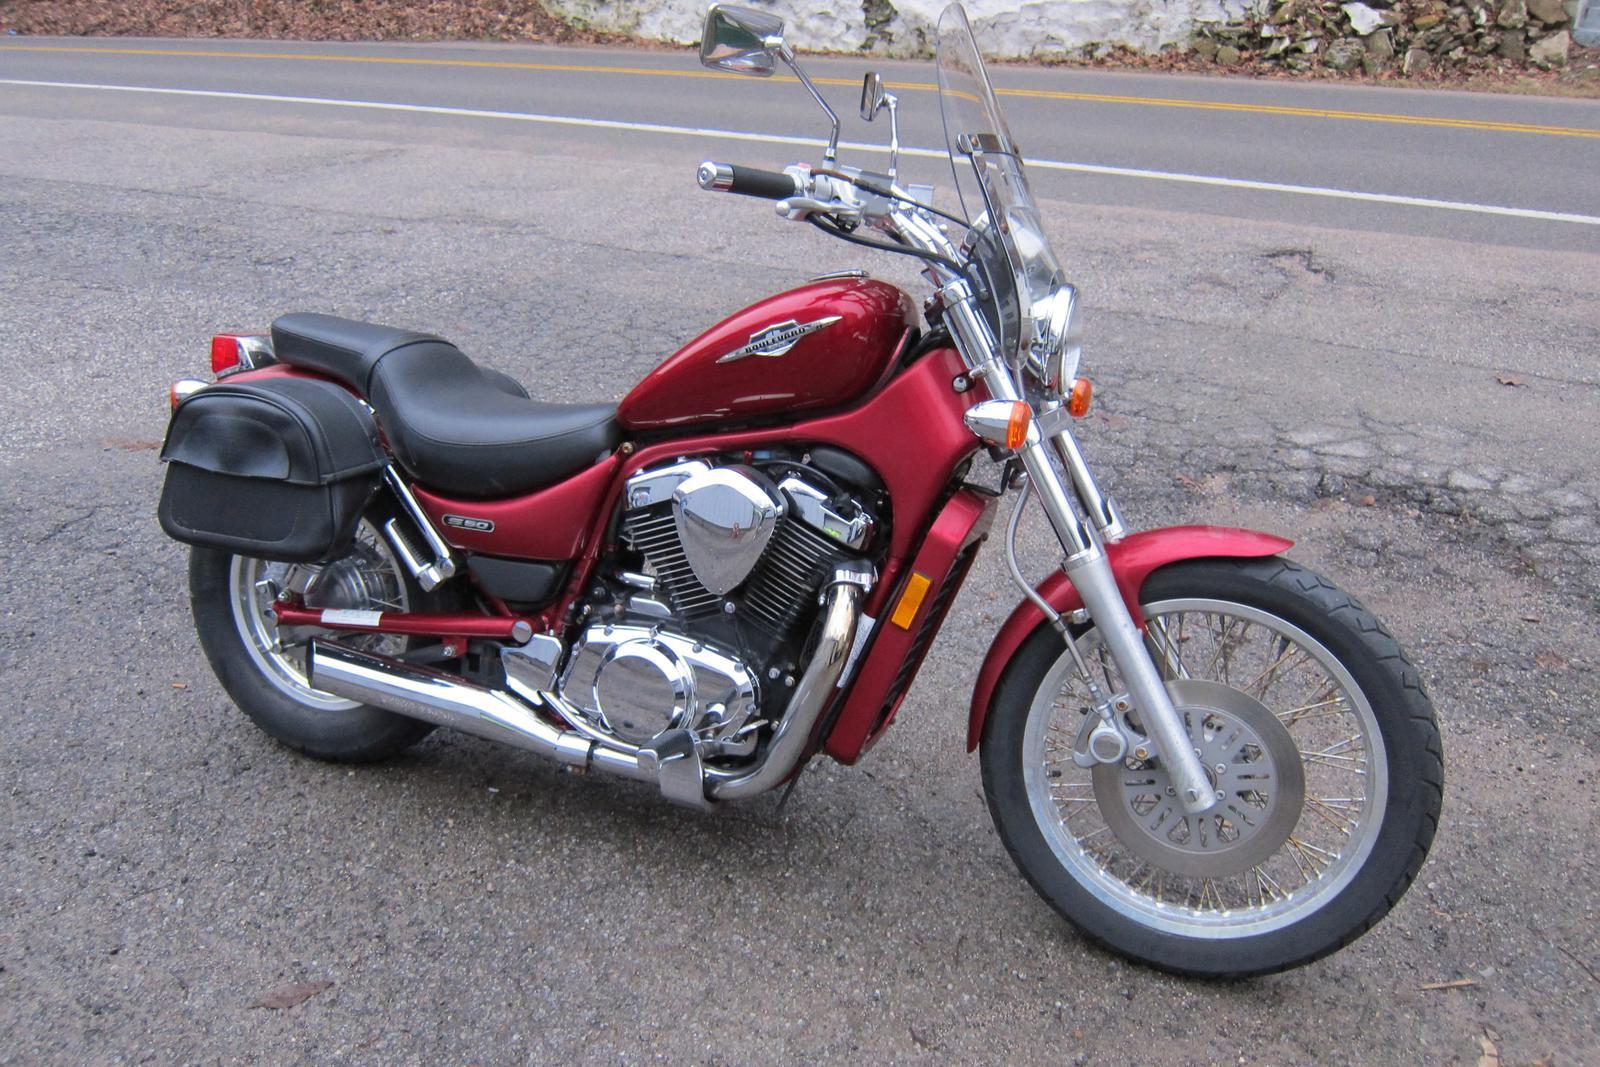 Inventory Blizzard s Custom Cycle & ATV Charleston WV 304 744 3223